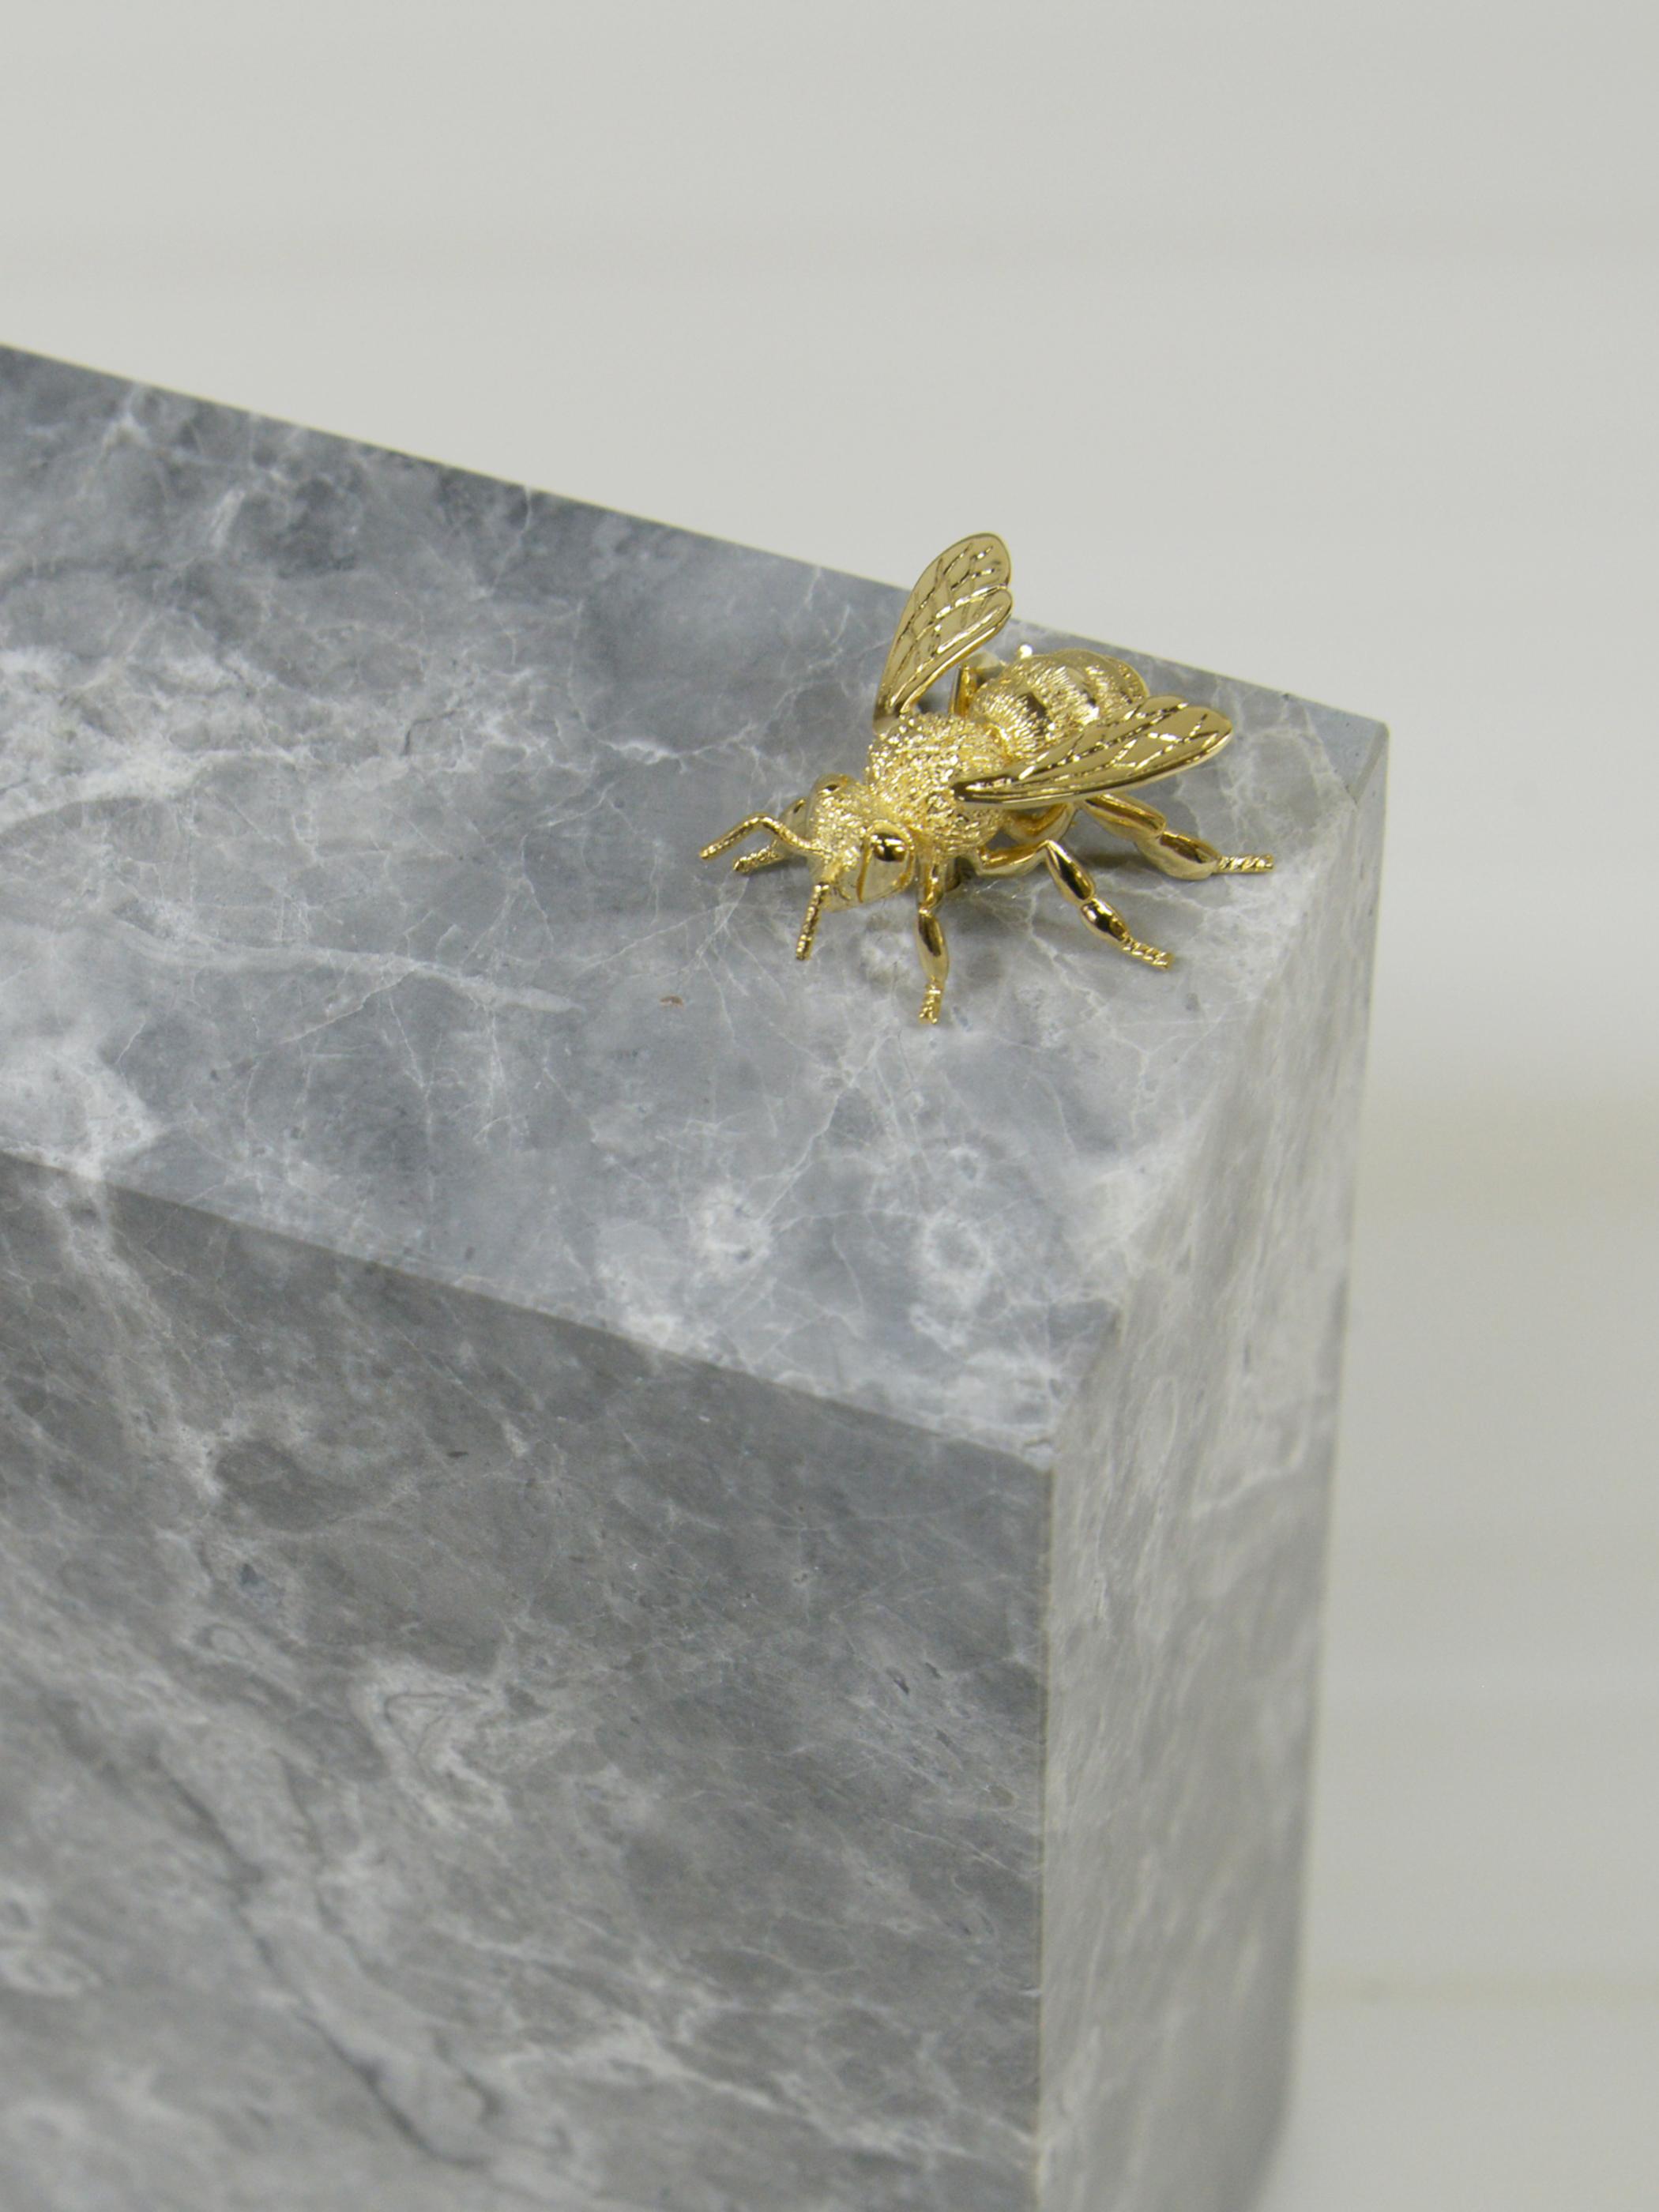 2018 exhibition ''moraltone'' marble block with bee【emperador royal chrome】